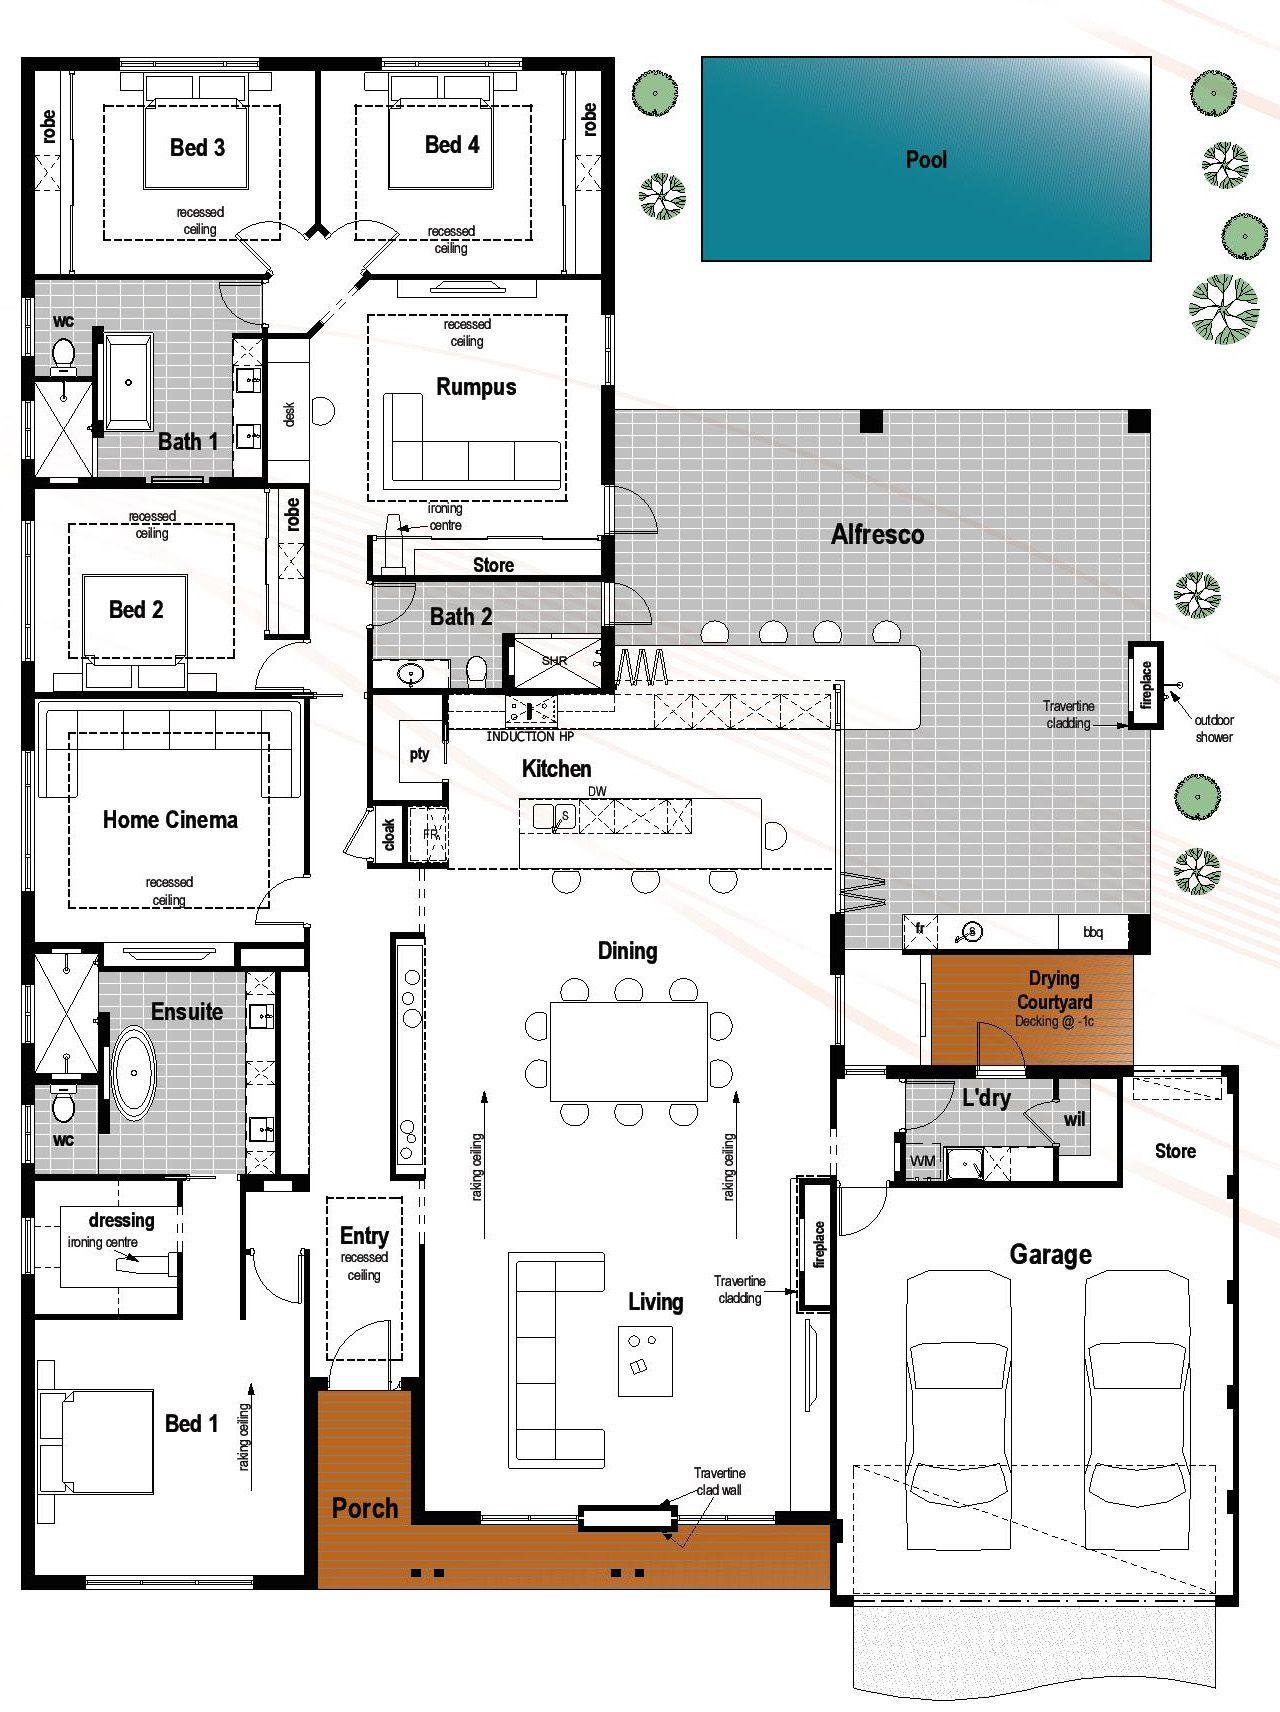 Floor Plan Friday 4 Bedroom 3 Bathroom With Modern Skillion Roof House Layouts House Plans House Floor Plans